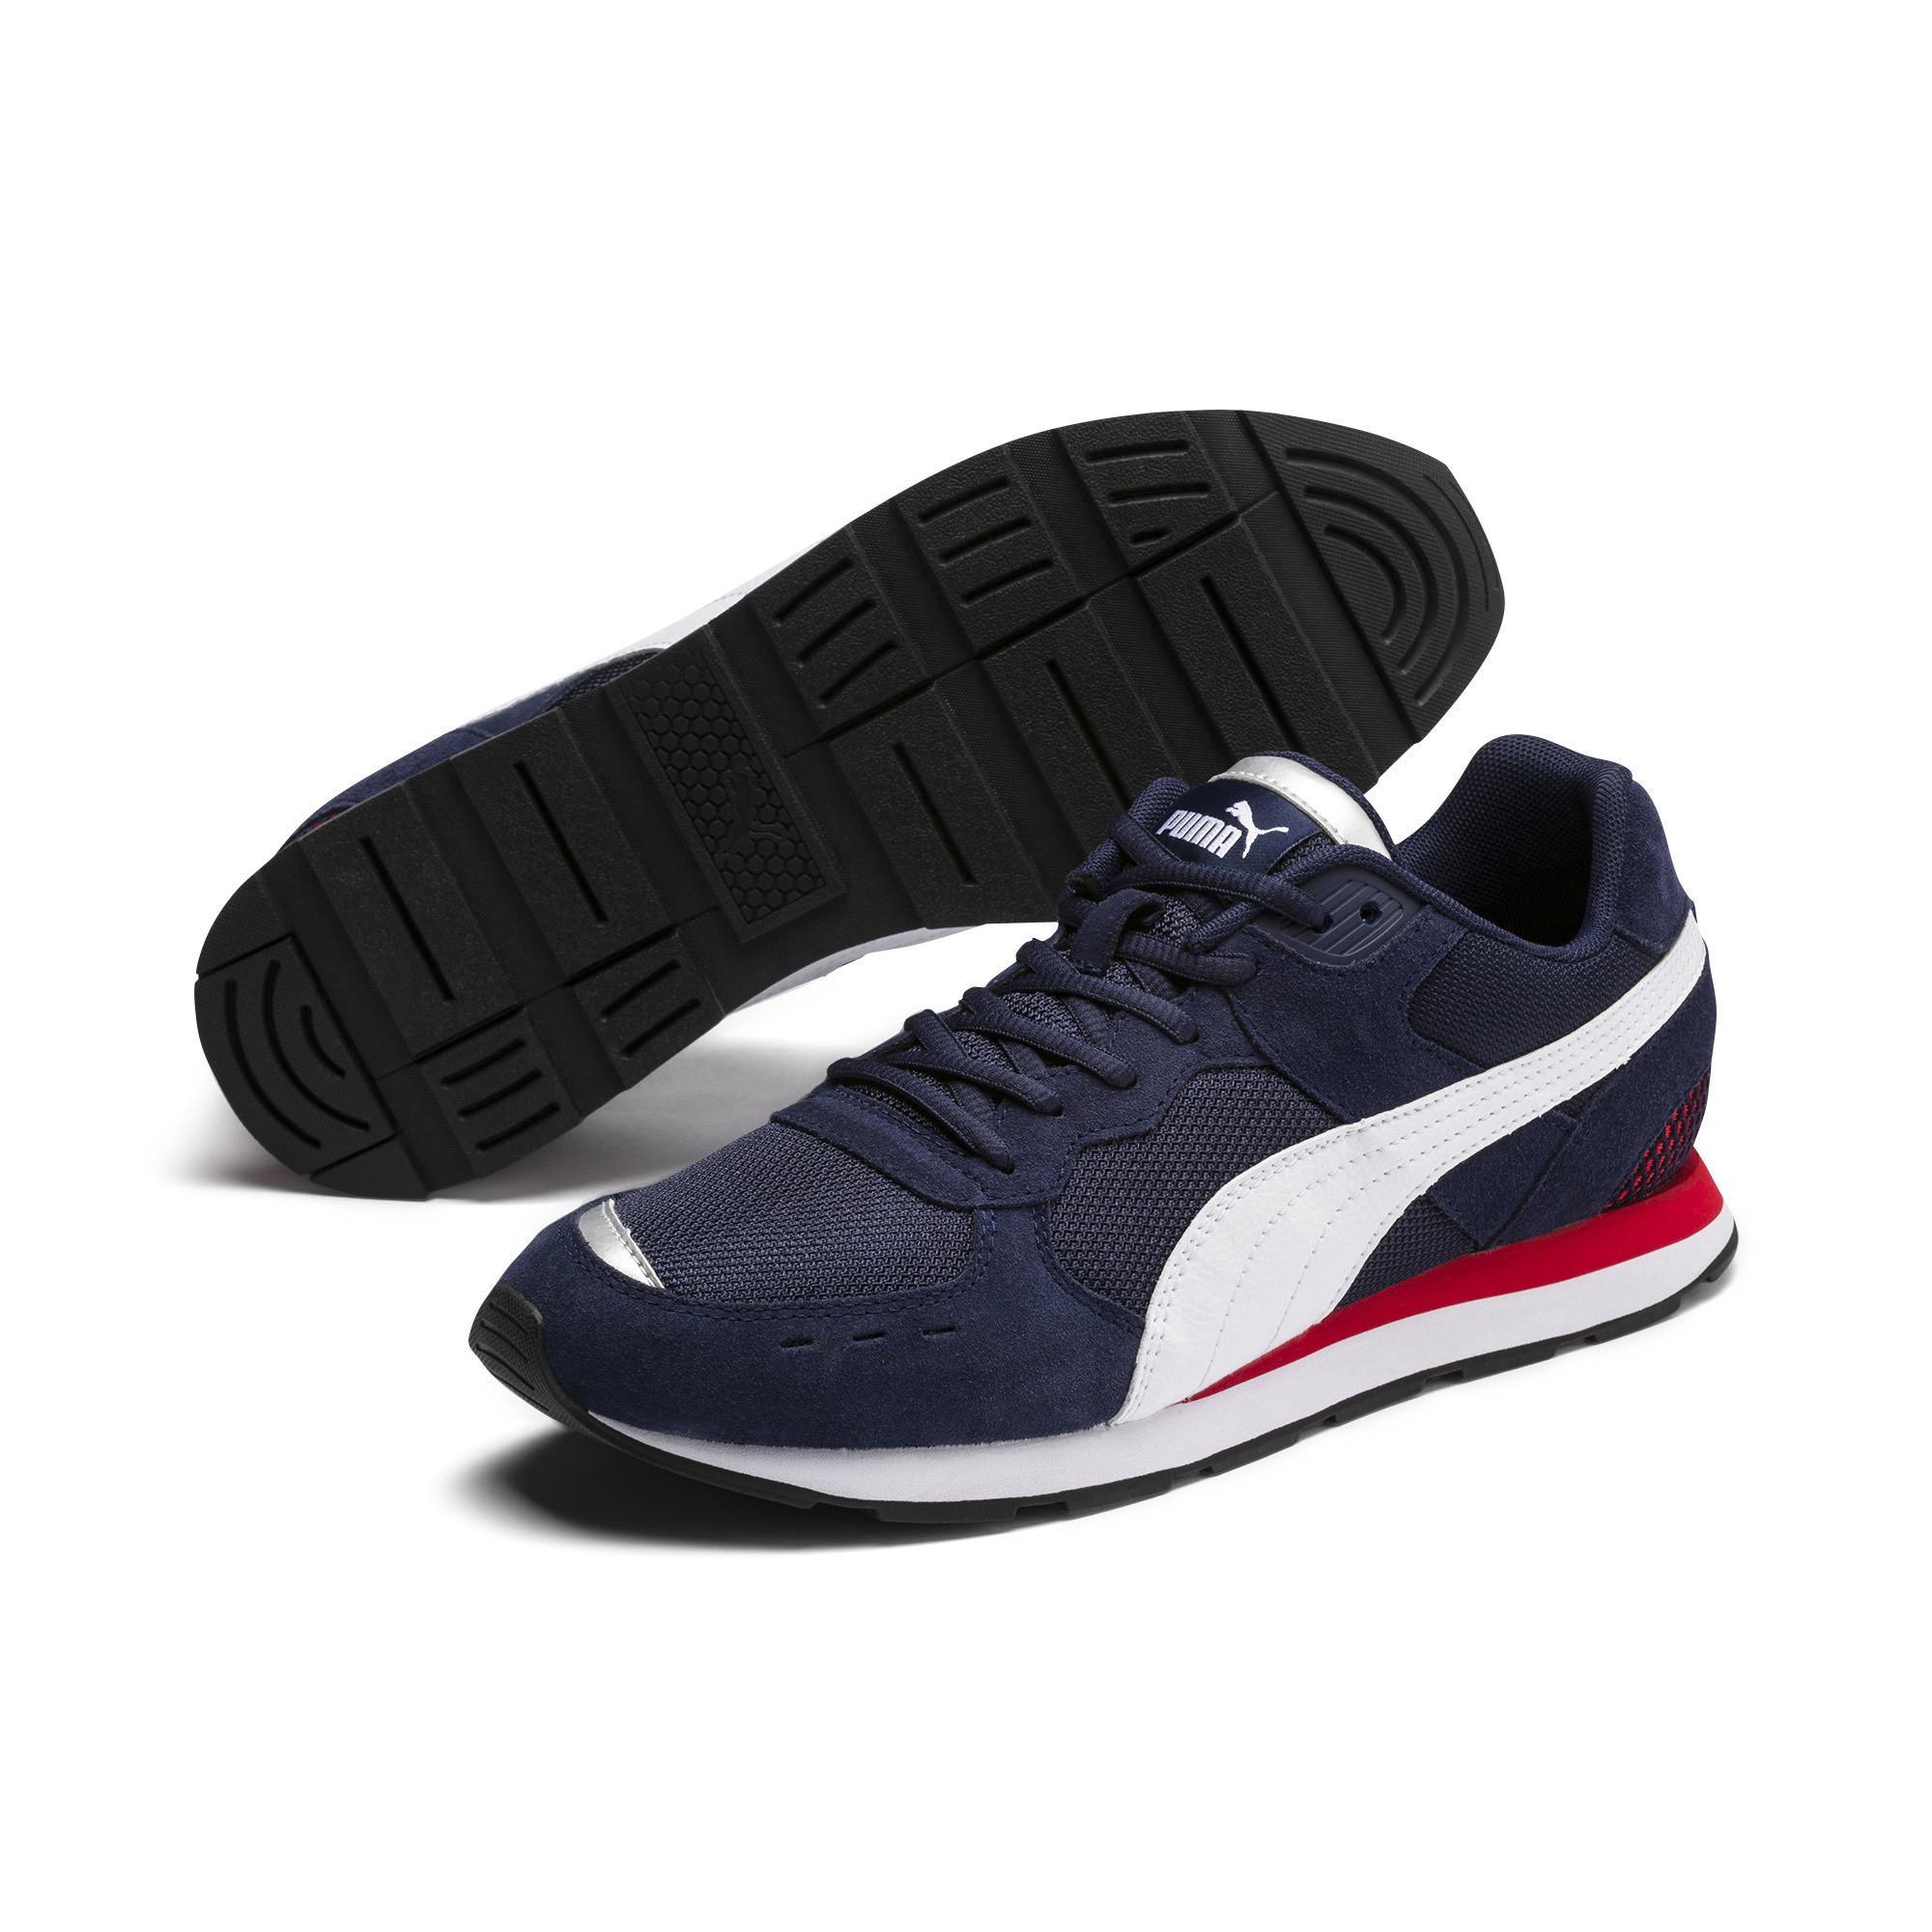 PUMA Vista Sneakers in Blue for Men - Lyst